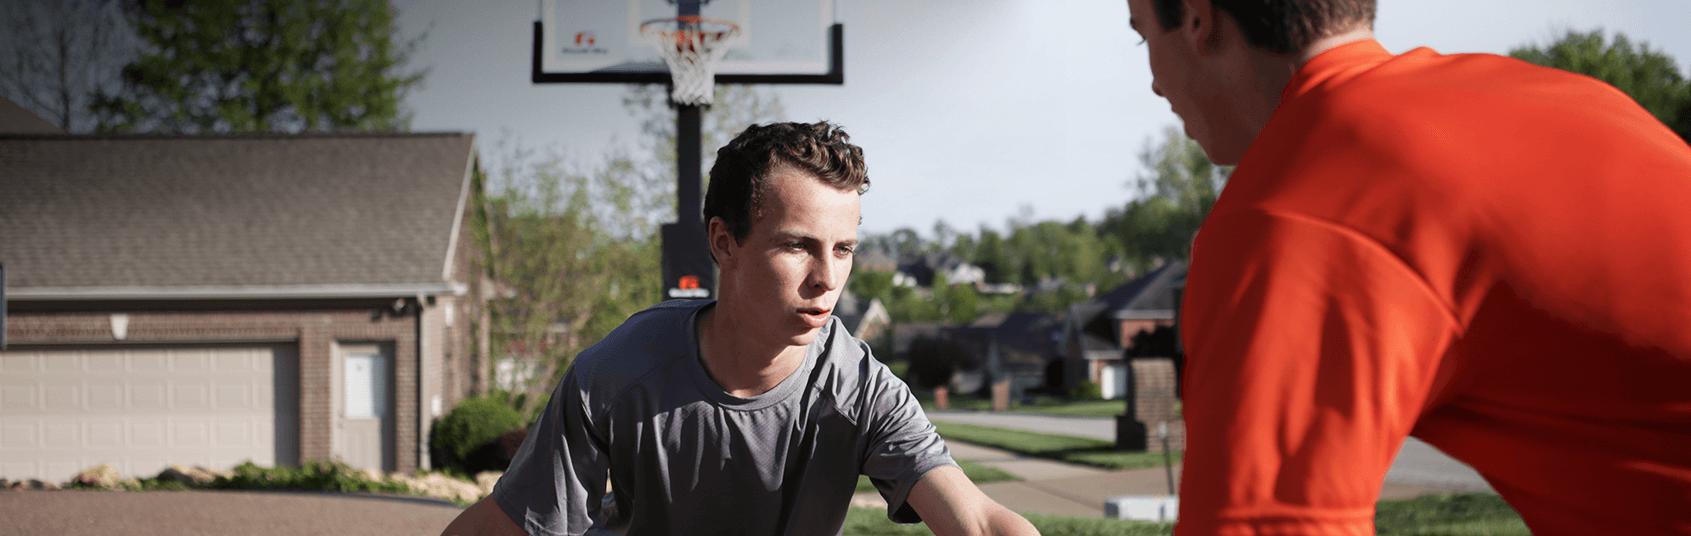 Basketball Clothing   Amazon.com